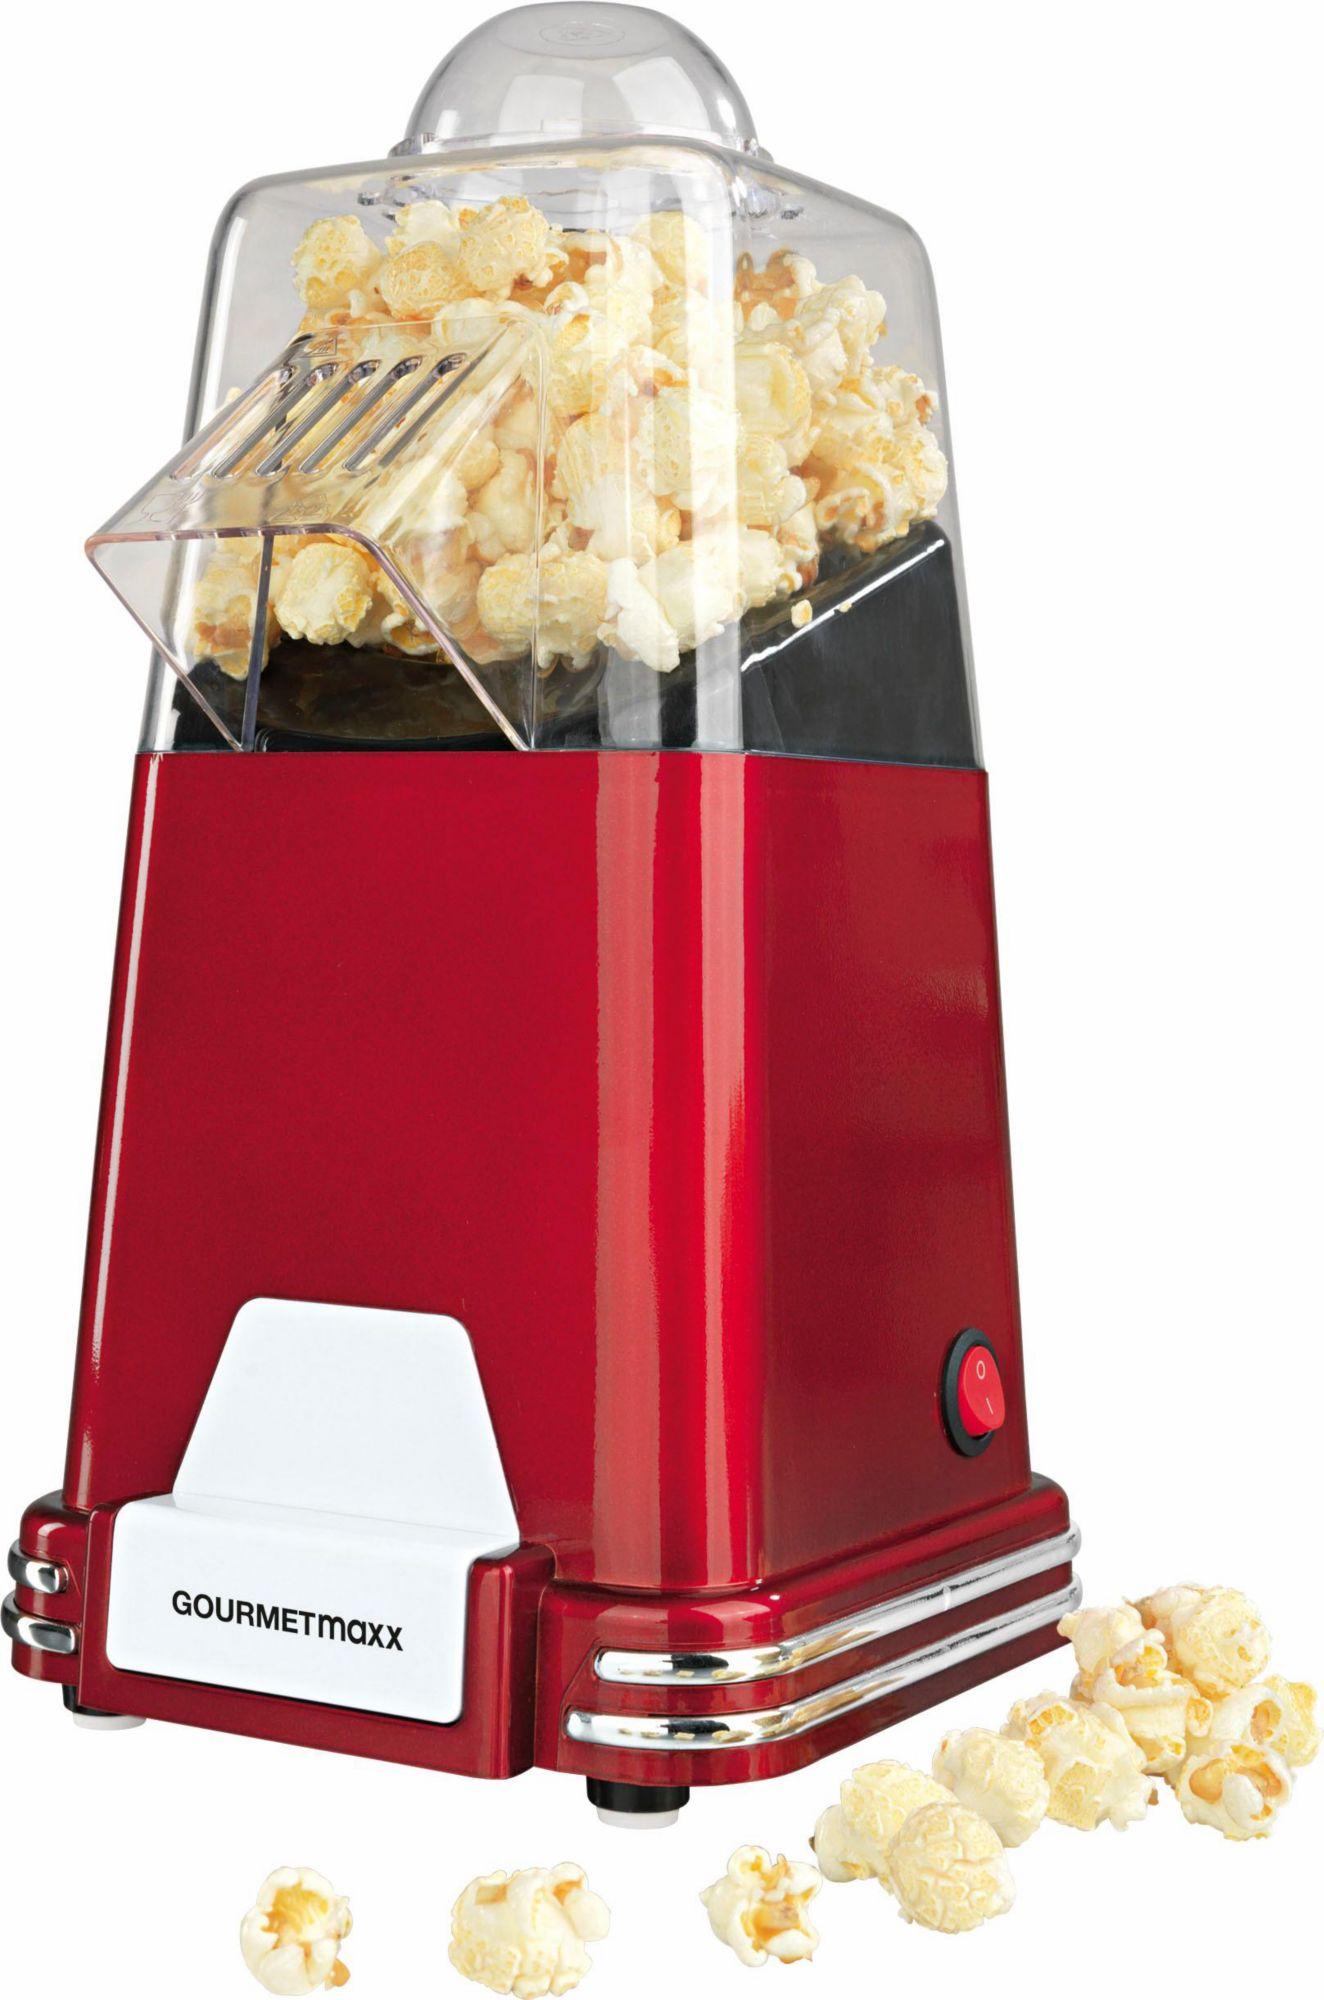 GOURMETMAXX Gourmet Maxx Popcorn-Maschine, 1000 Watt, rot